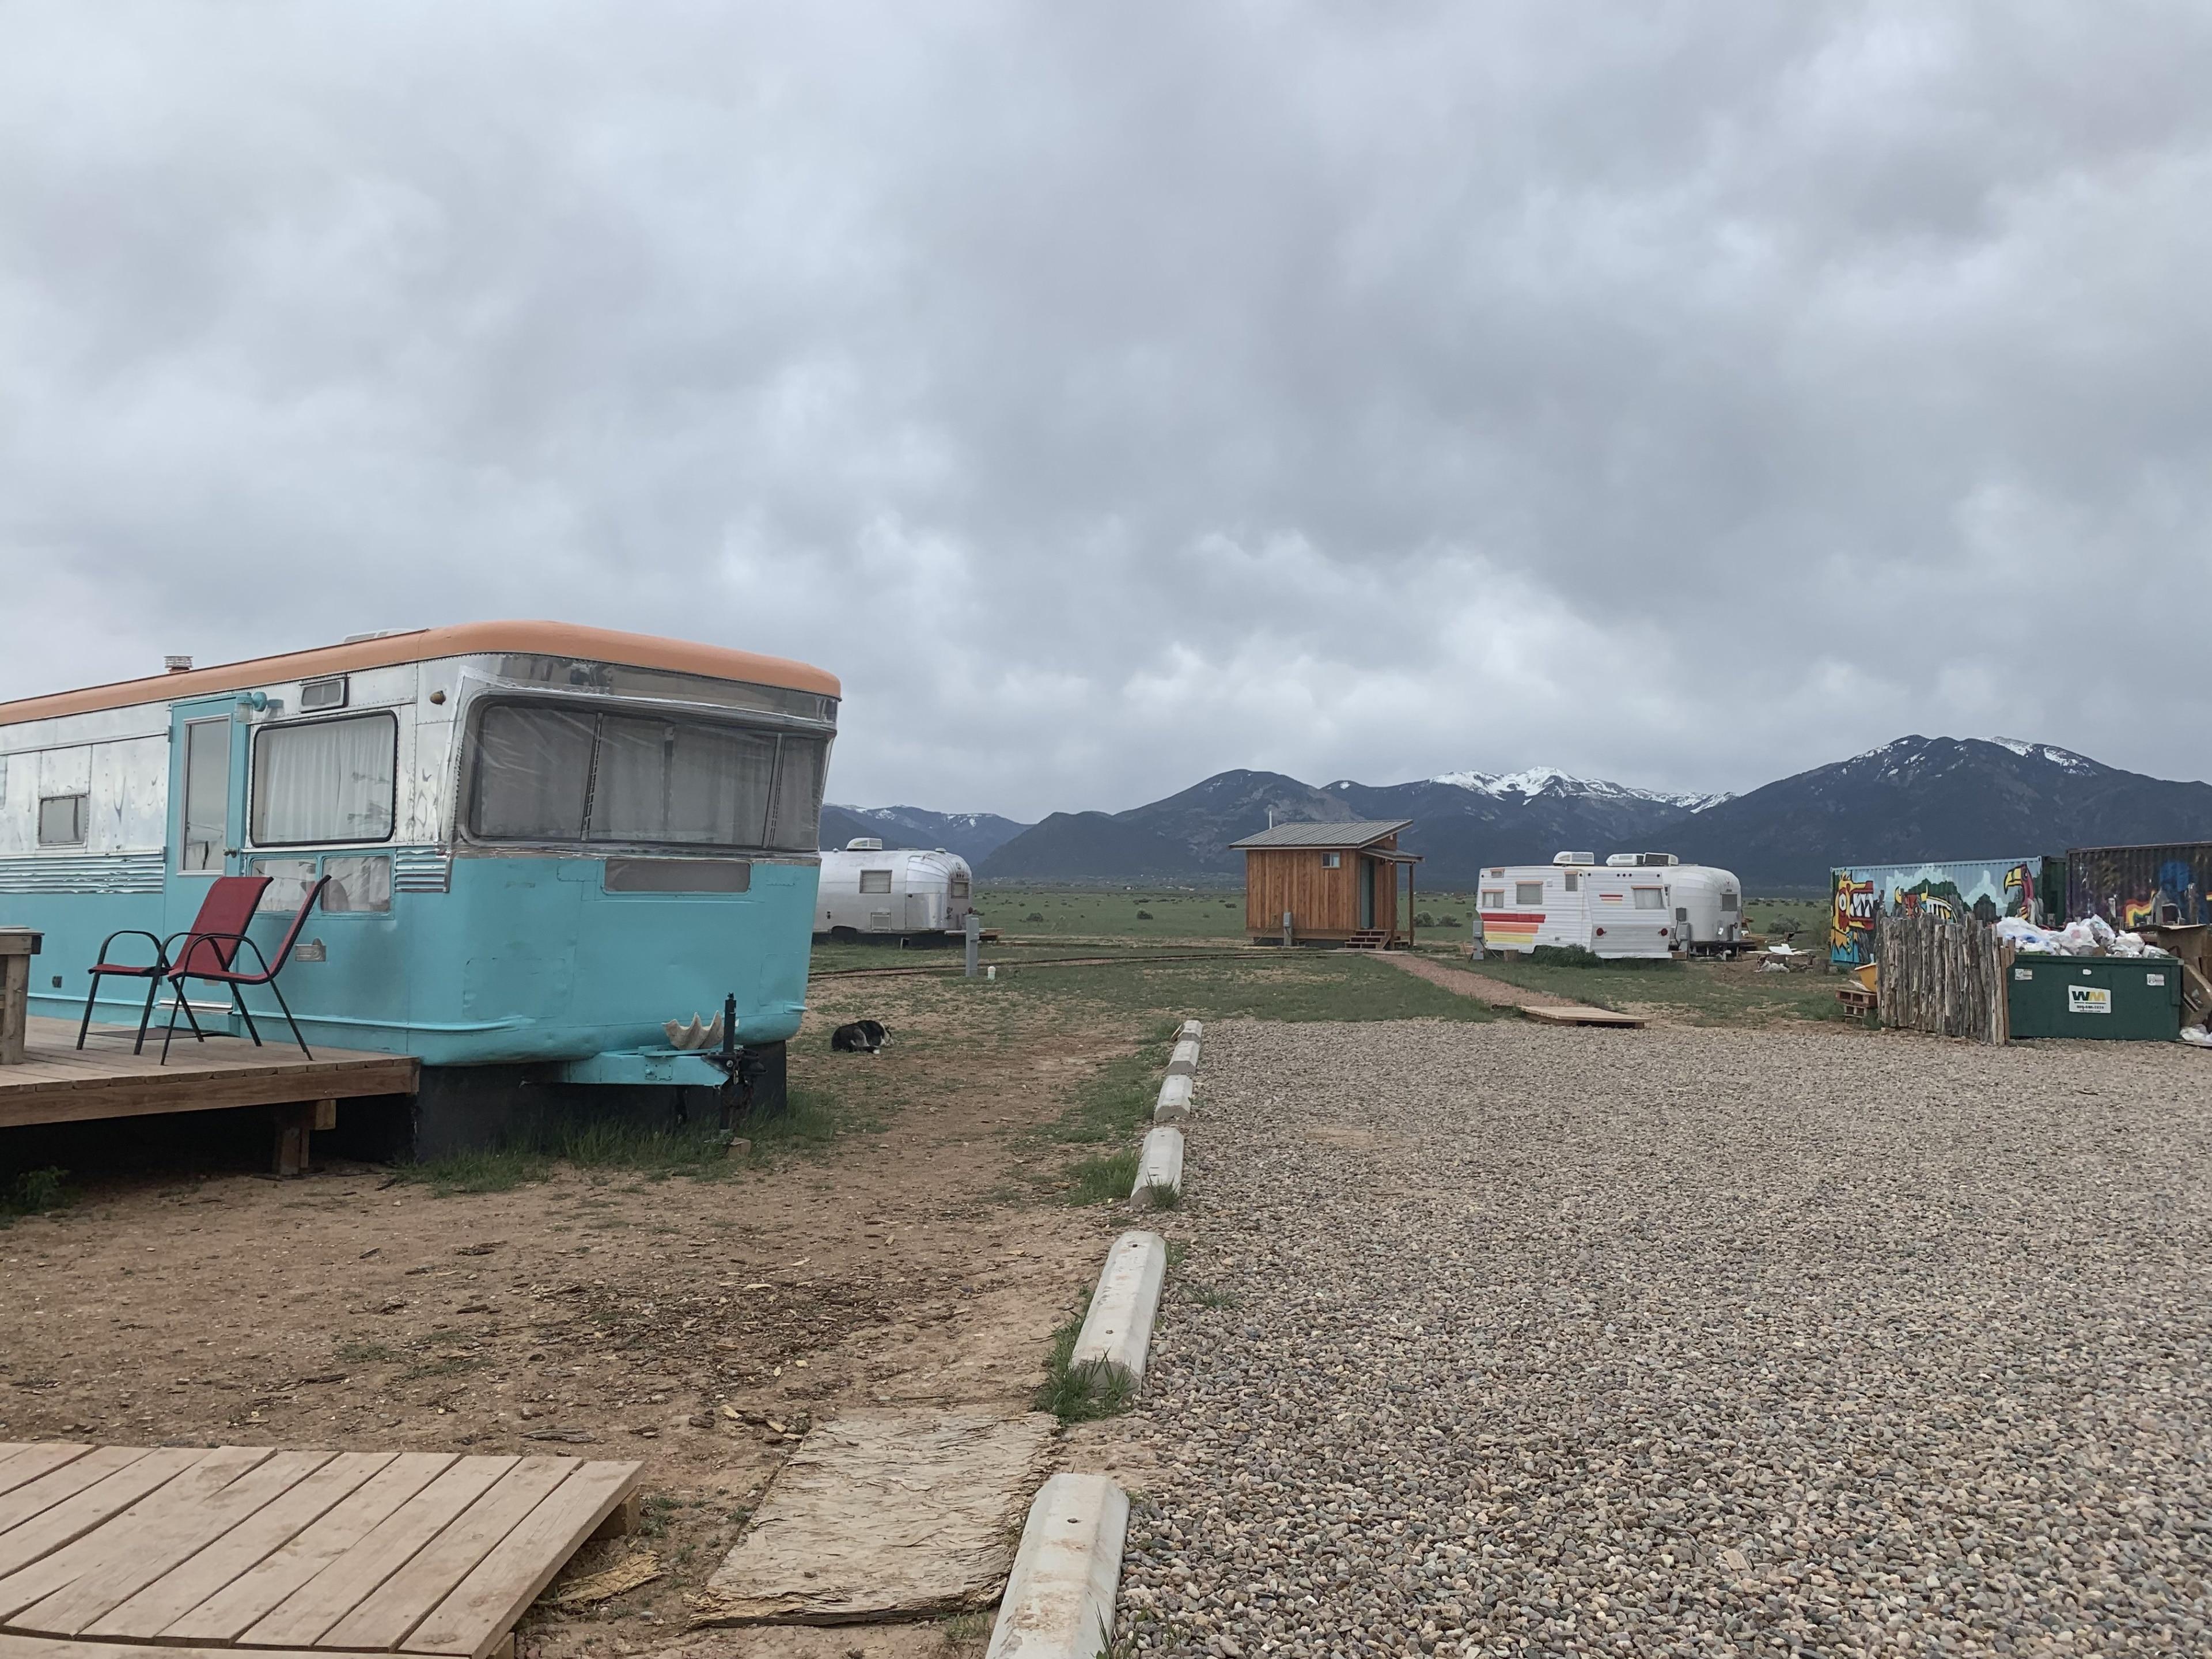 El Prado, New Mexico, United States of America